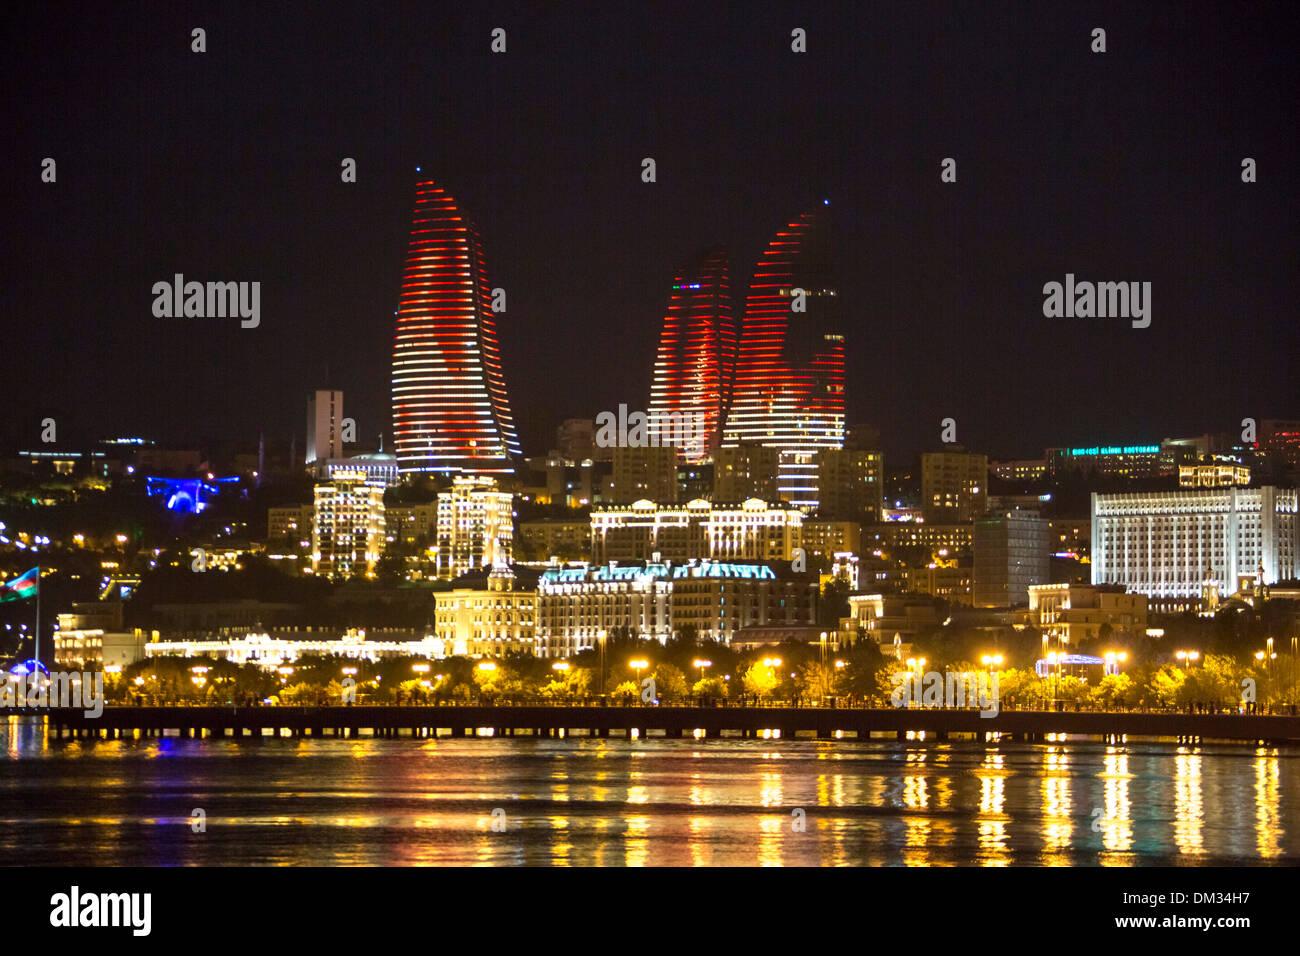 Aserbaidschan Kaukasus Eurasia Baku Regierung Architektur Avenue City Innenstadt Haus Sonnenuntergang Reisen beleuchtet Flame Towers Stockbild